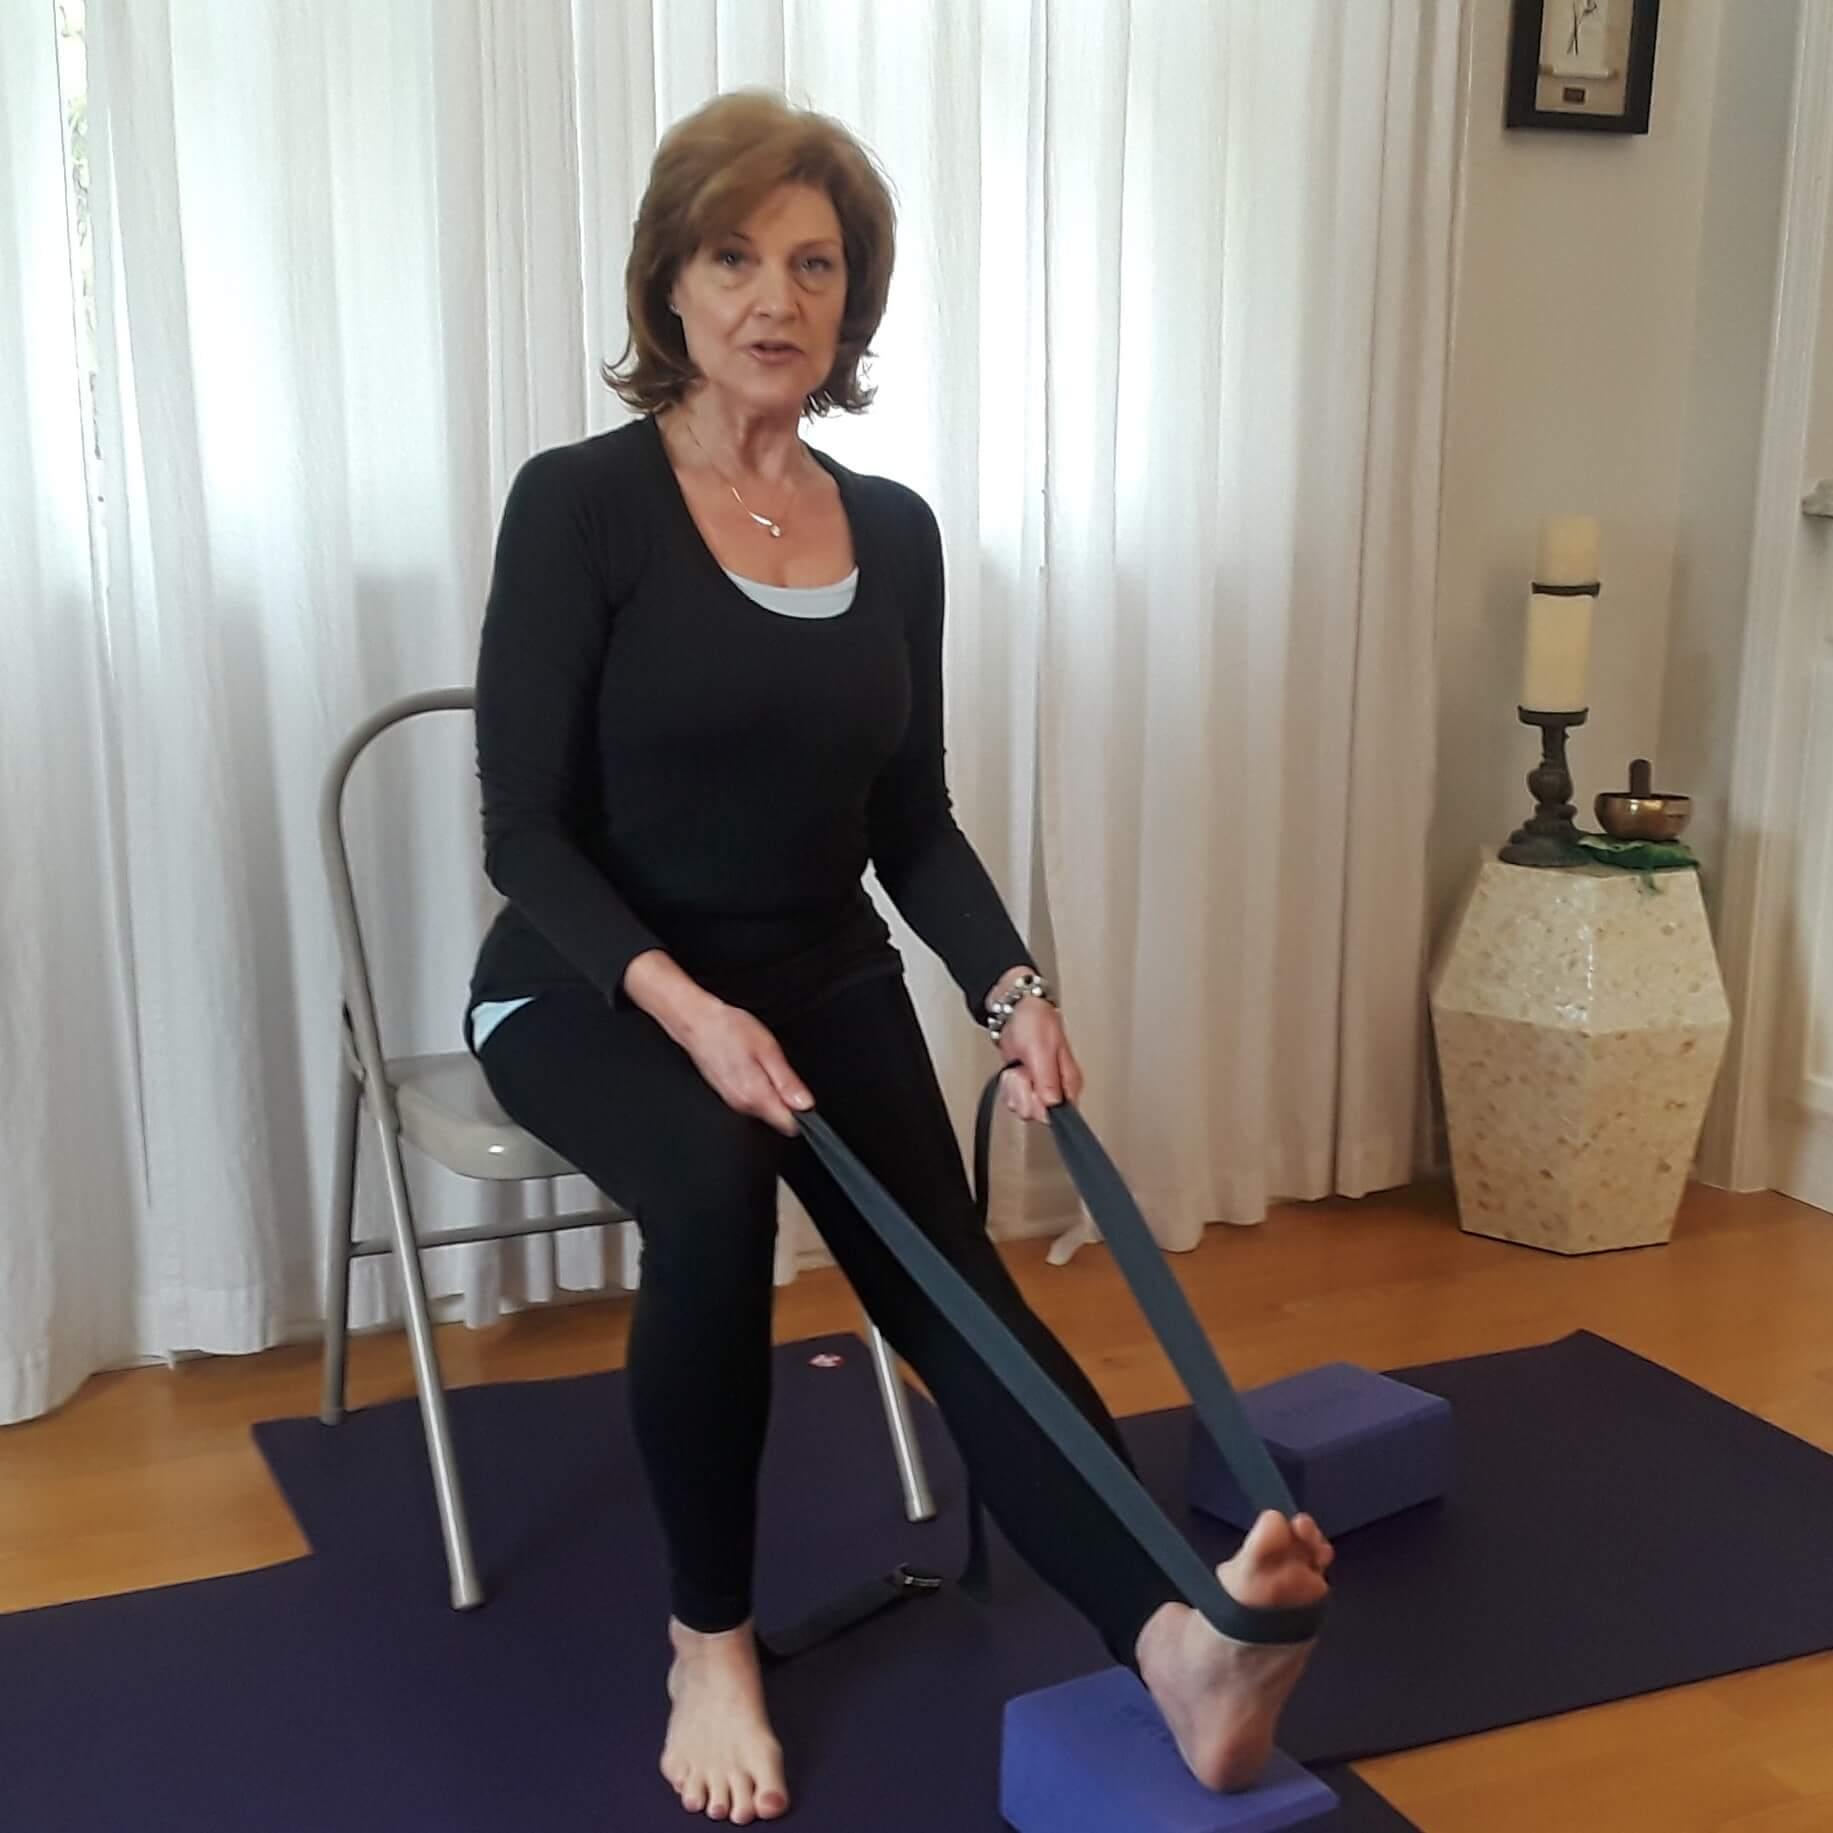 Chair Yoga - Mindful Movements